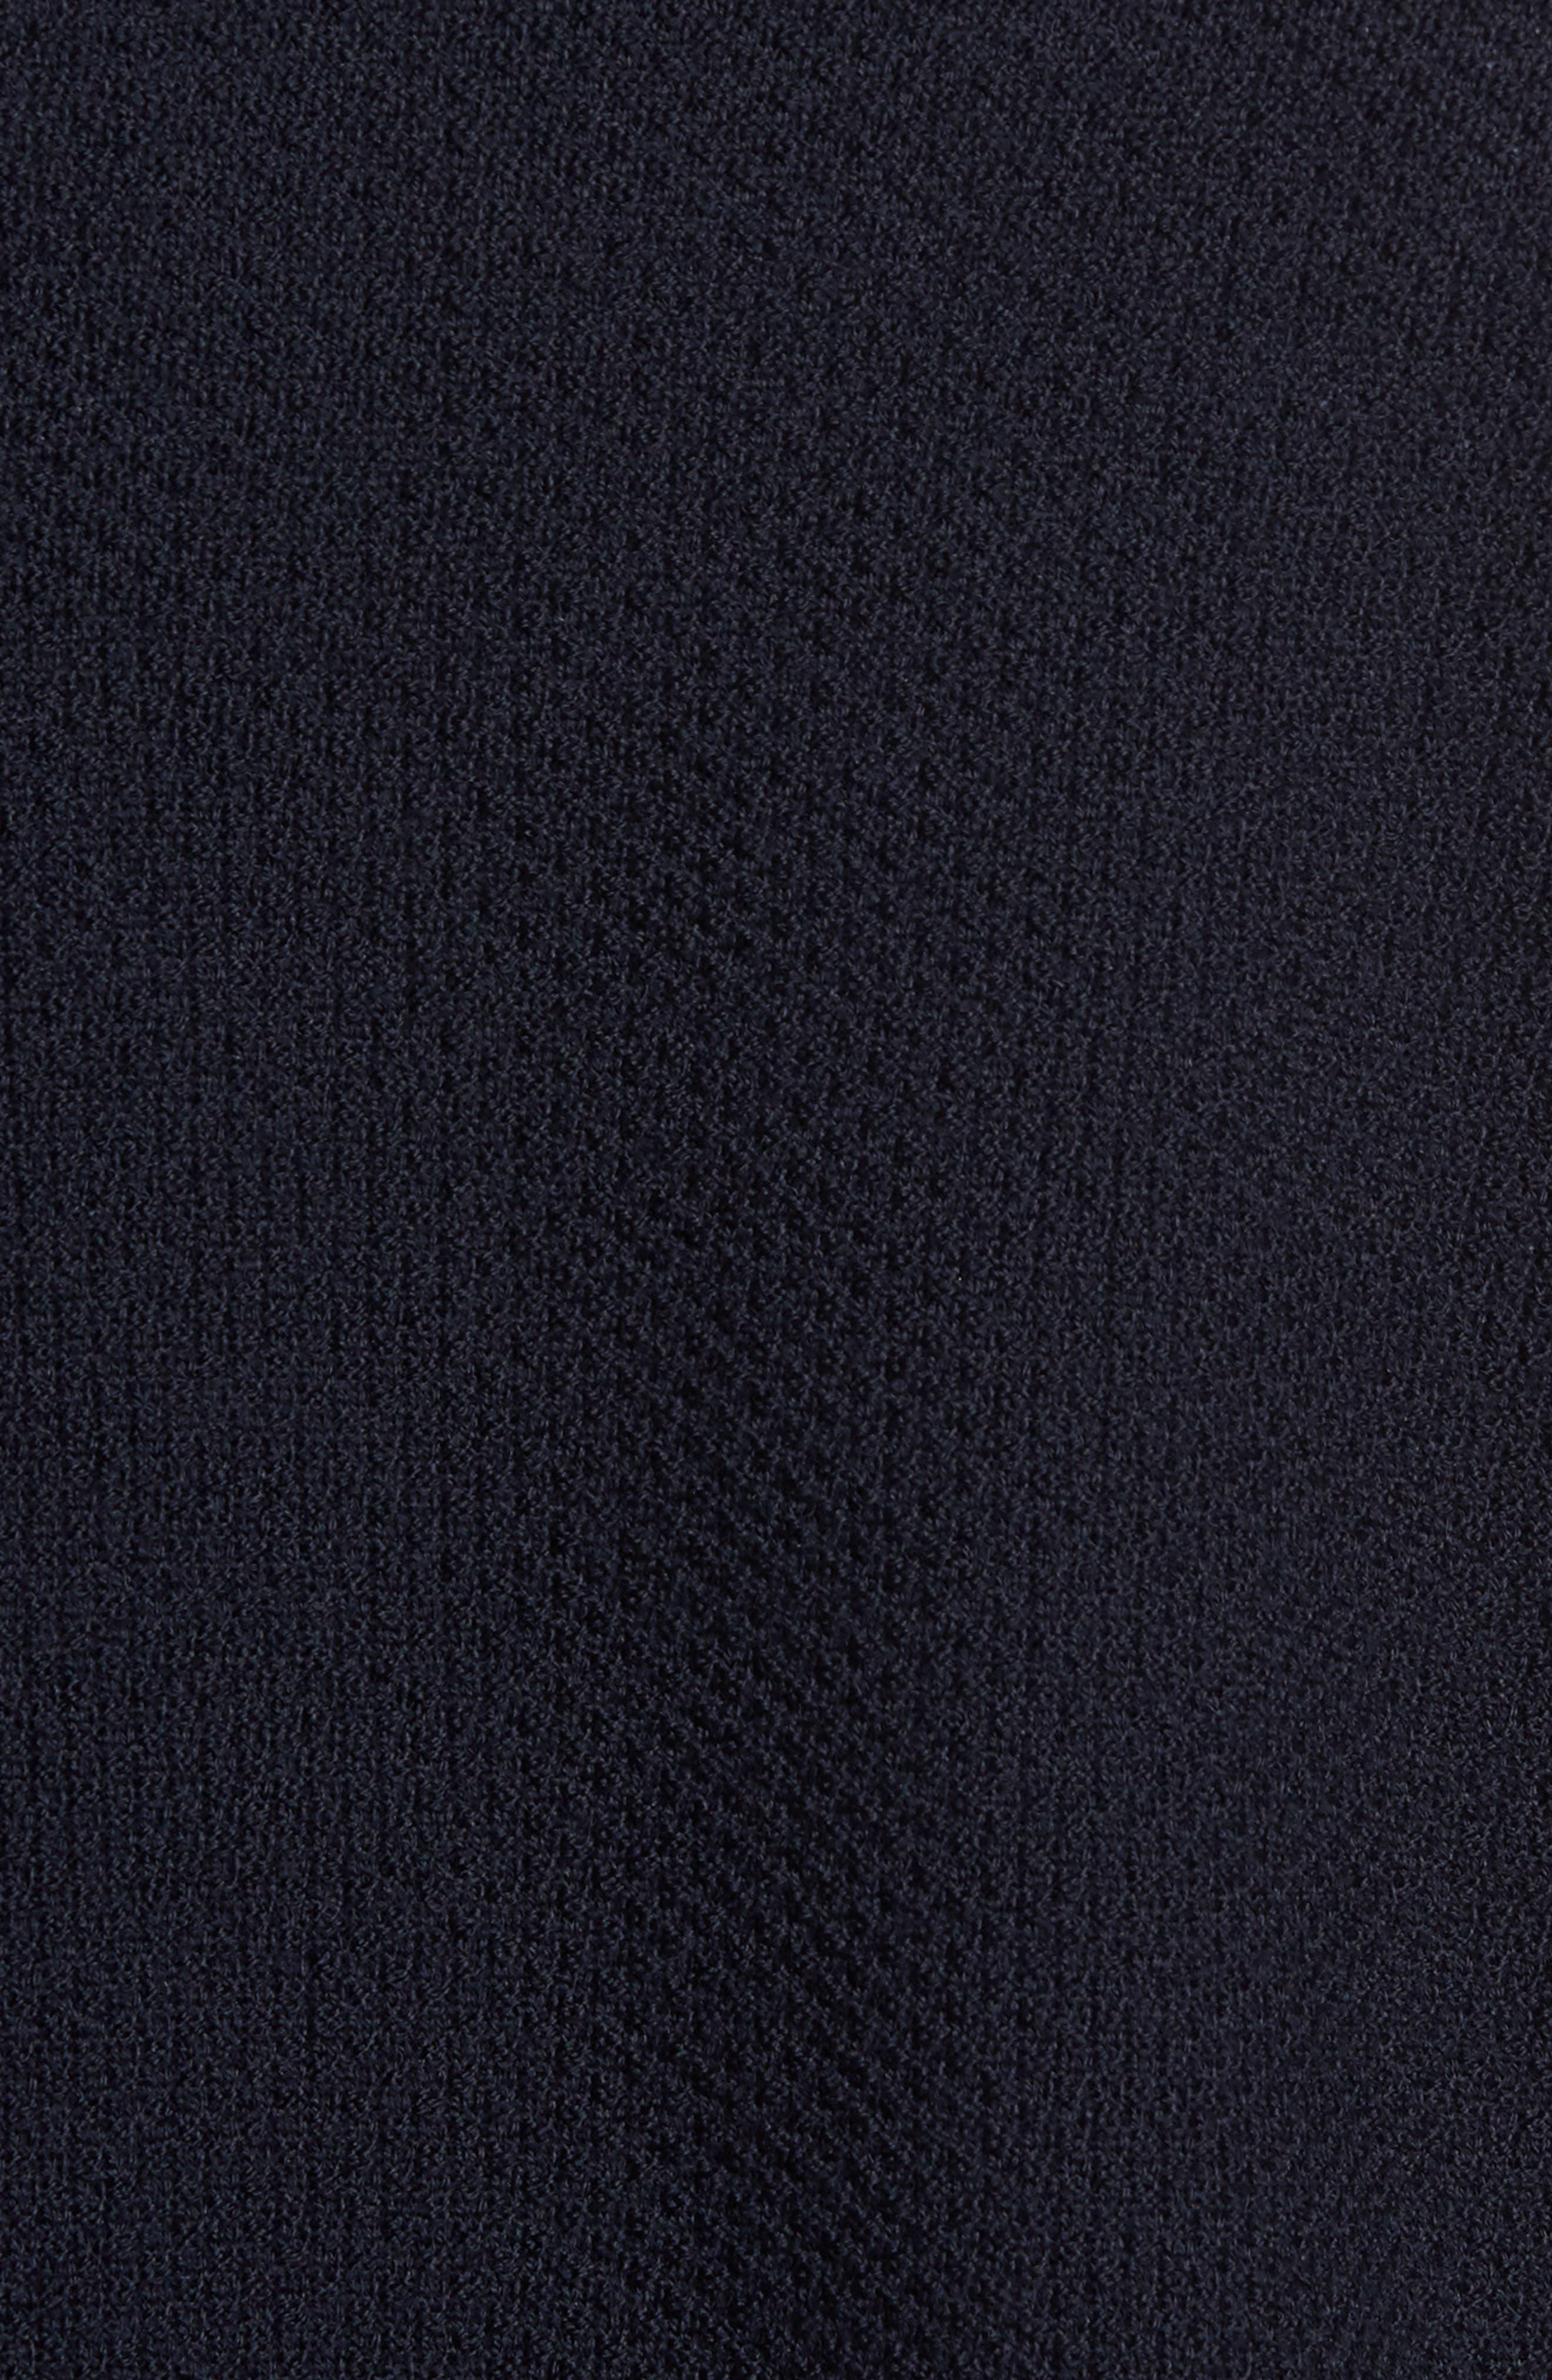 Alternate Image 5  - John Smedley Standard Fit Merino Wool Knit Jacket